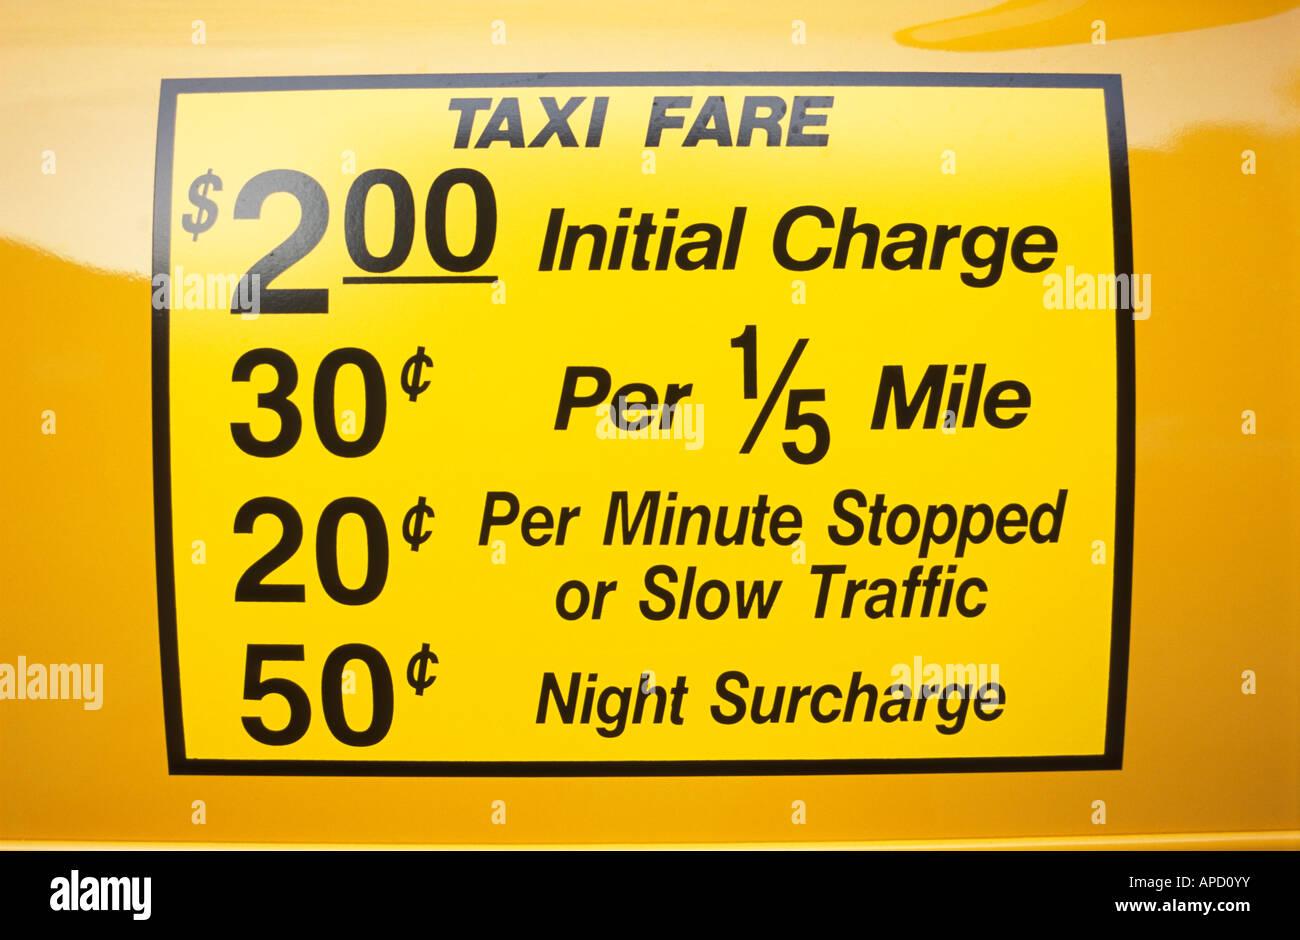 australia taxi fare rates taxi fare calculator lobster house. Black Bedroom Furniture Sets. Home Design Ideas